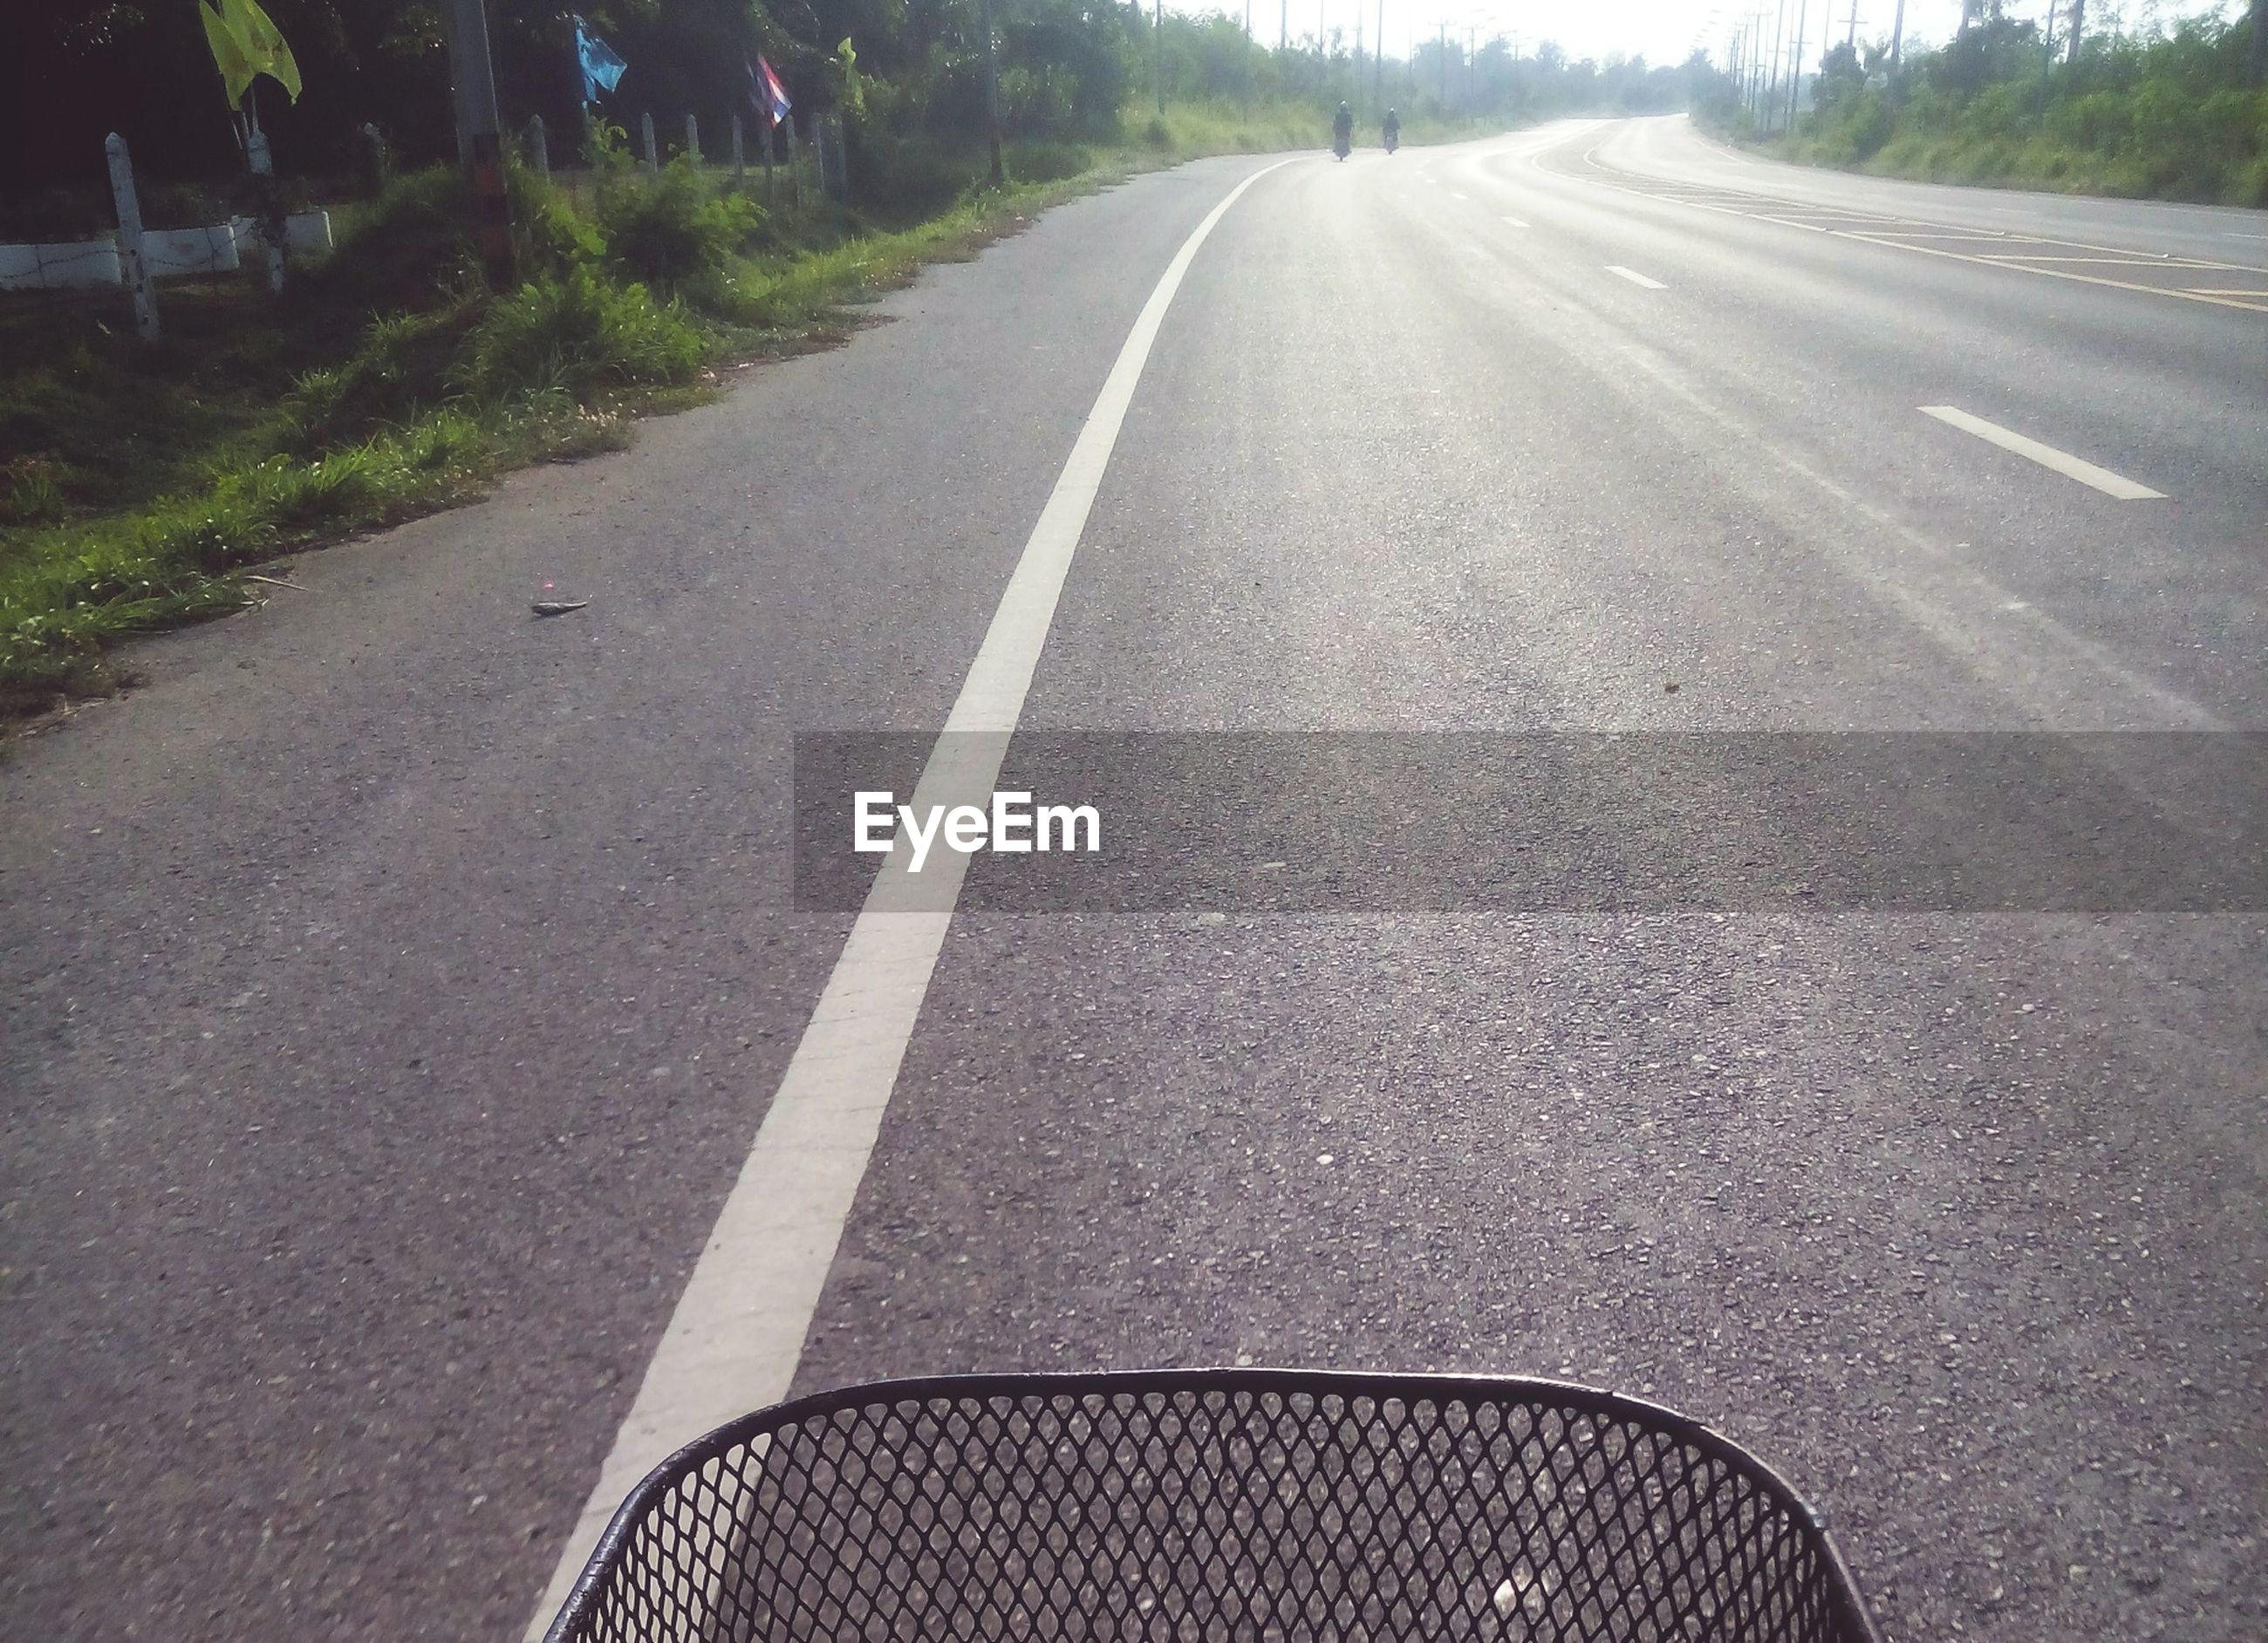 road, transportation, road marking, the way forward, asphalt, street, no people, day, outdoors, nature, tree